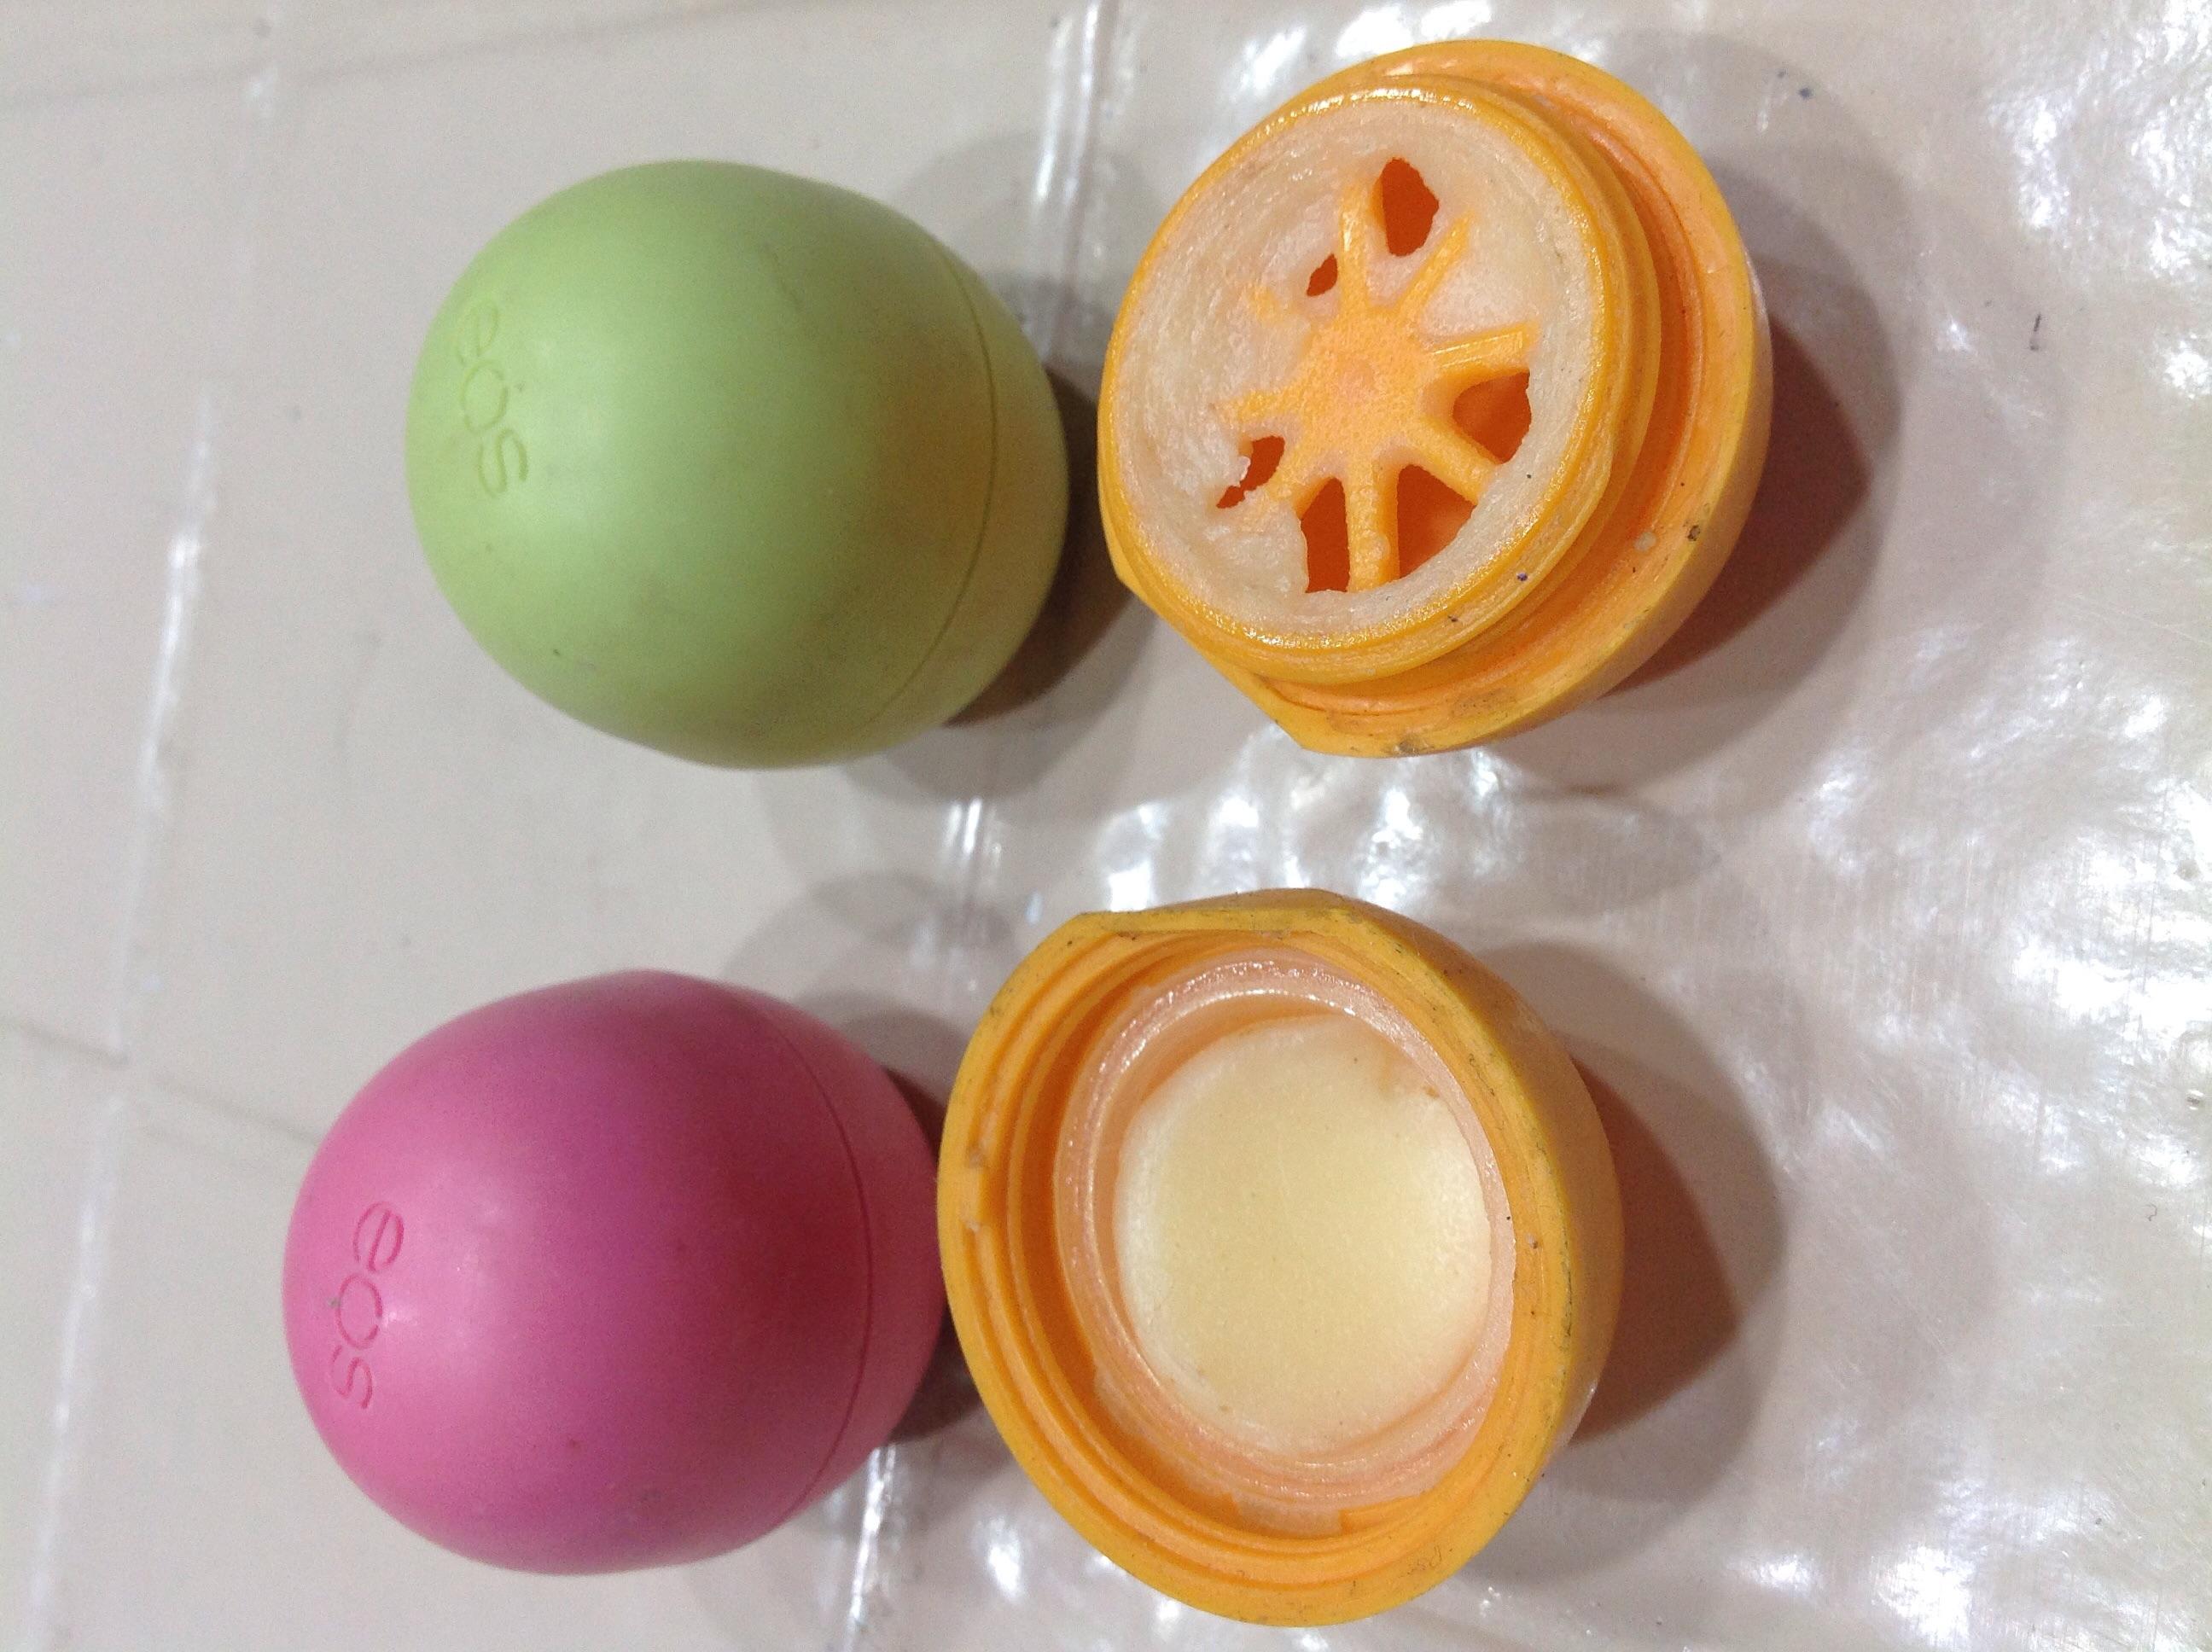 eos® Organic Smooth Sphere Lip Balm uploaded by Alex V.